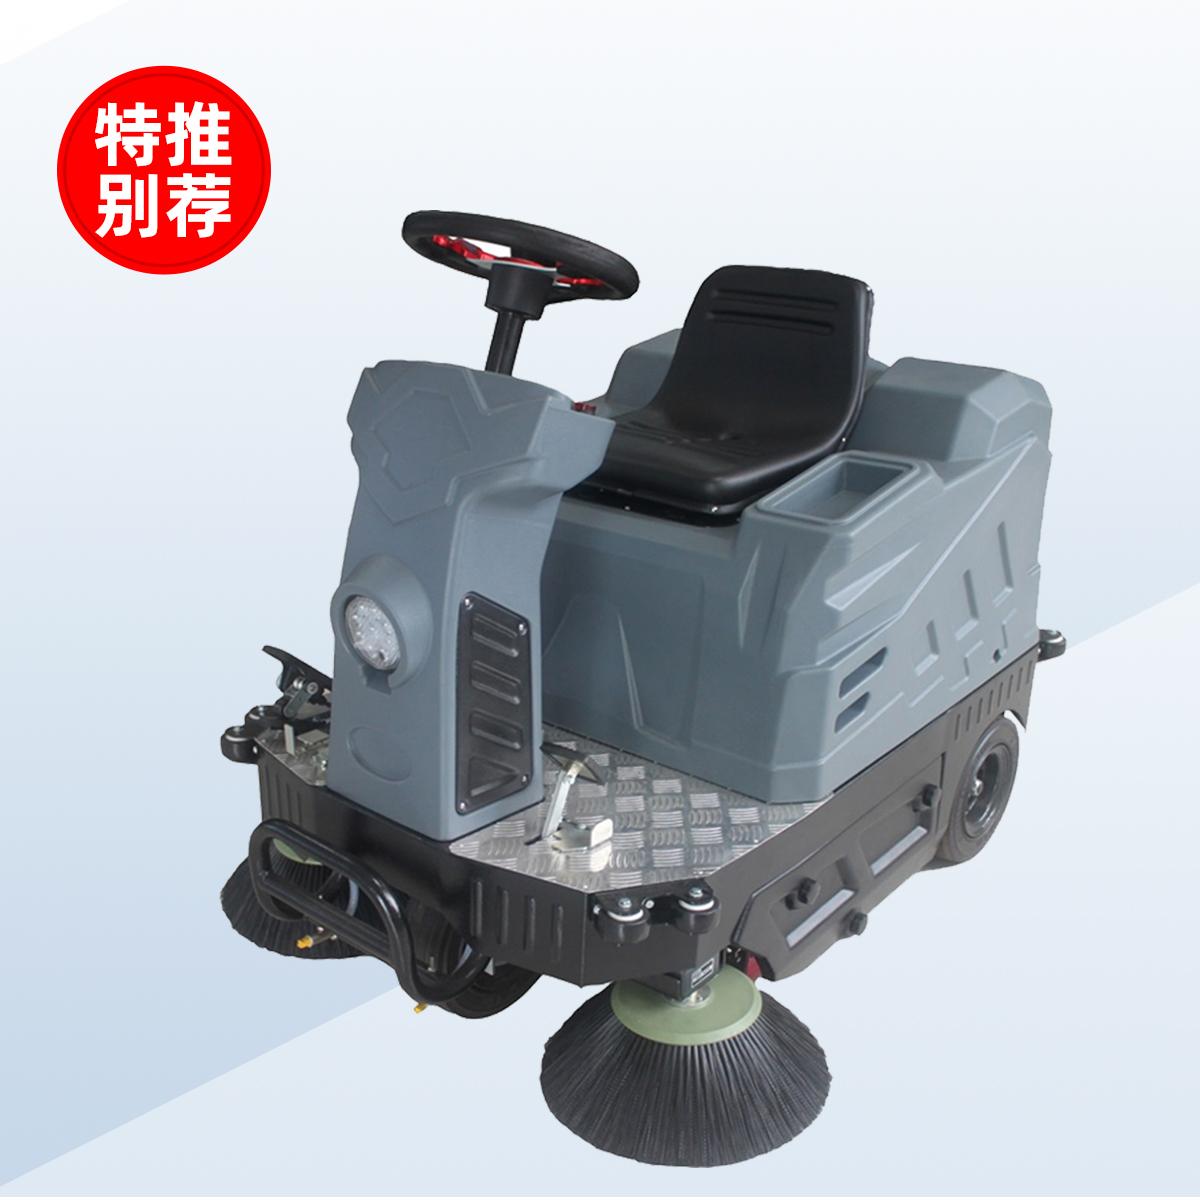 OS-V1小型驾驶式扫地机